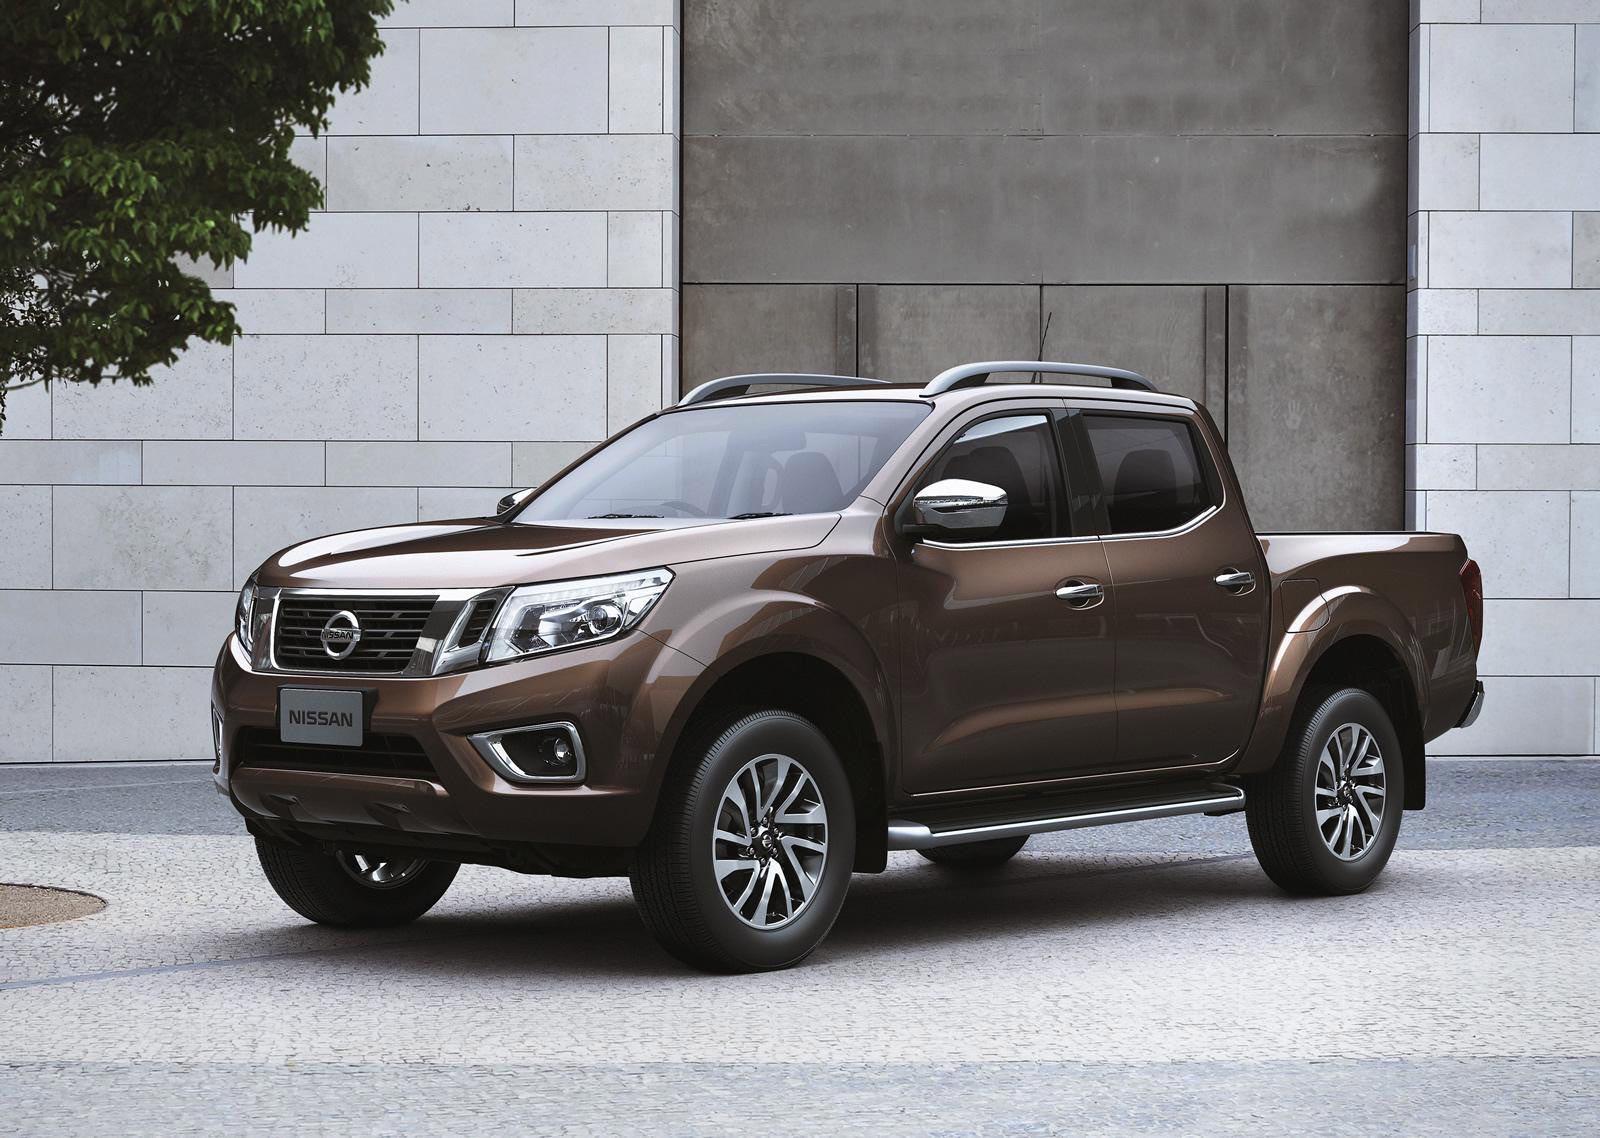 2015 Nissan Navara - Picture 103495